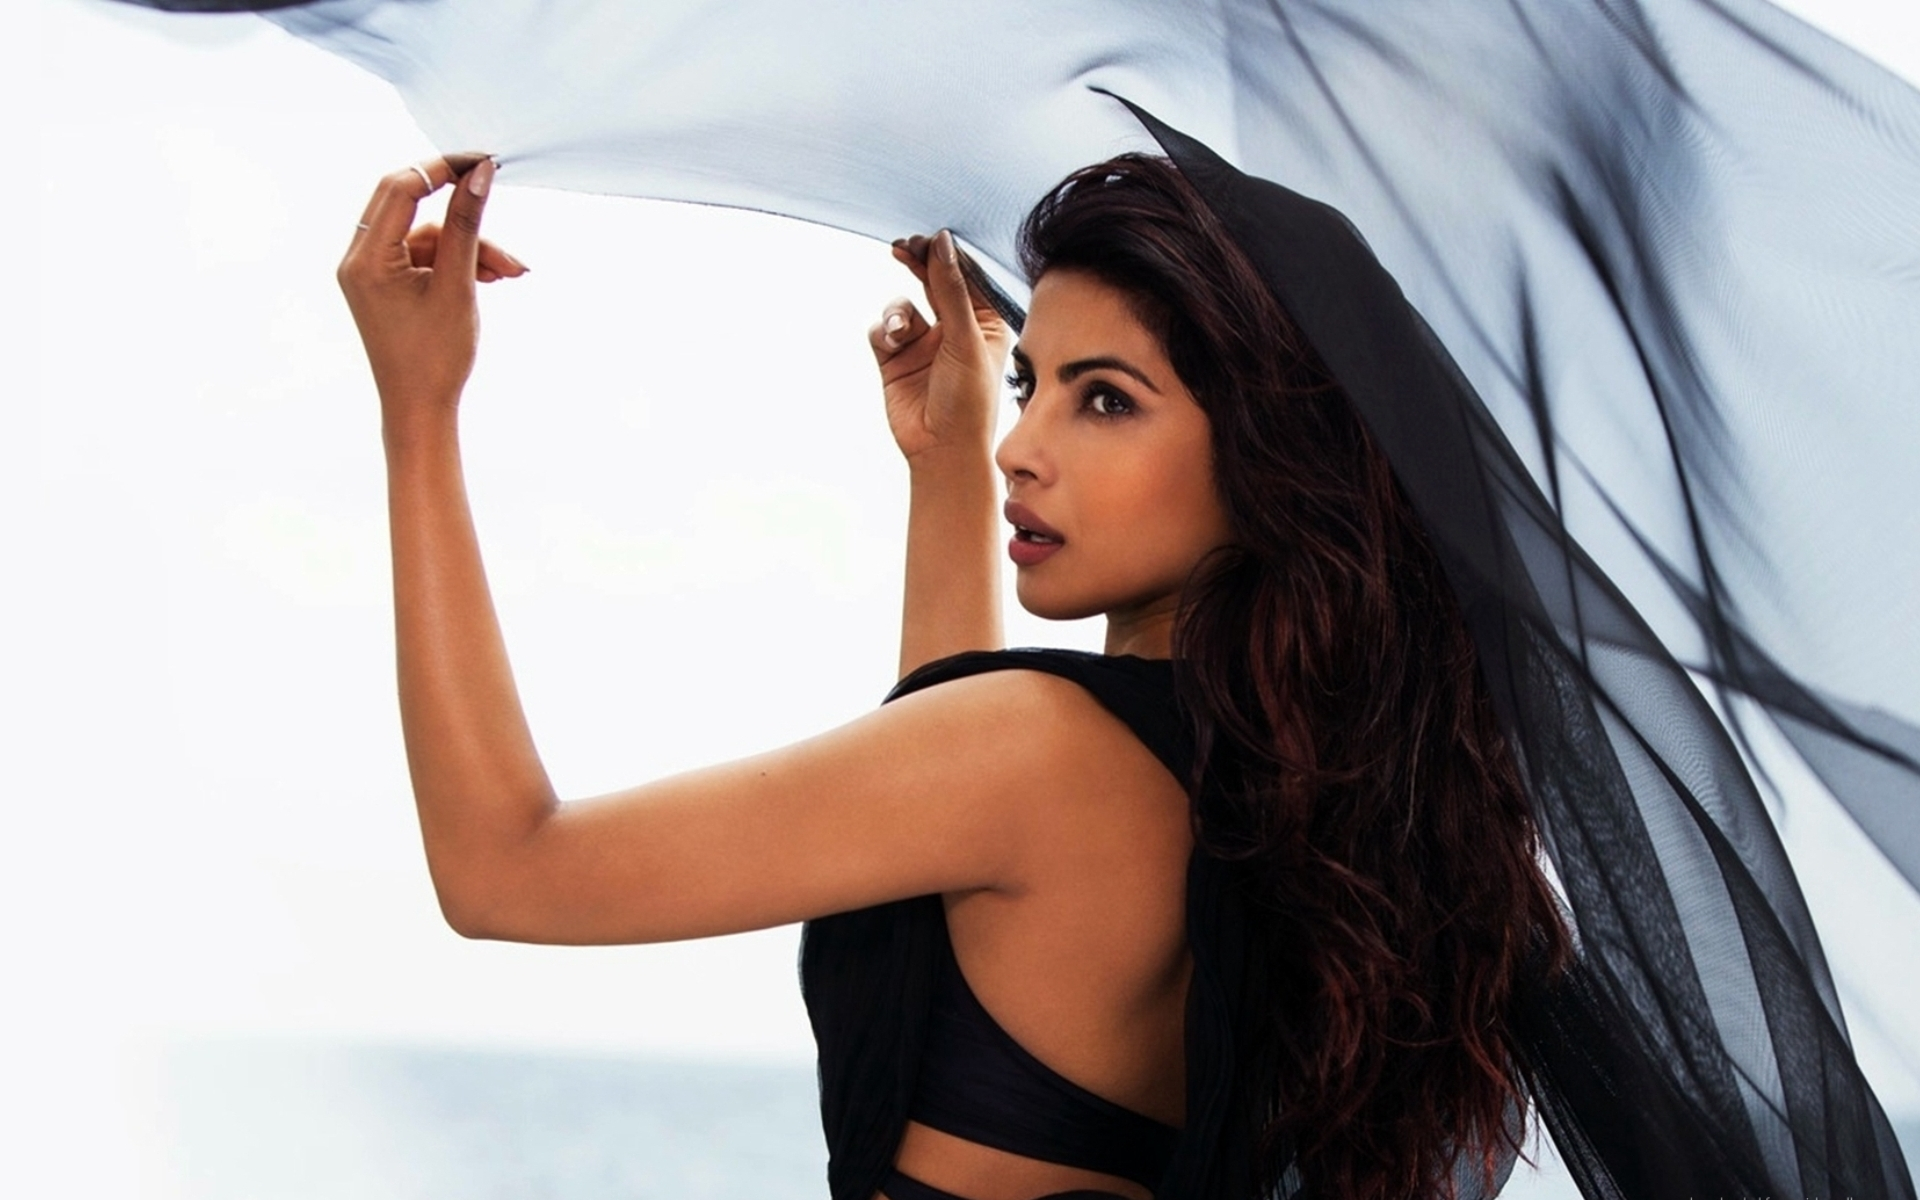 priyanka chopra wallpapers, pictures, images